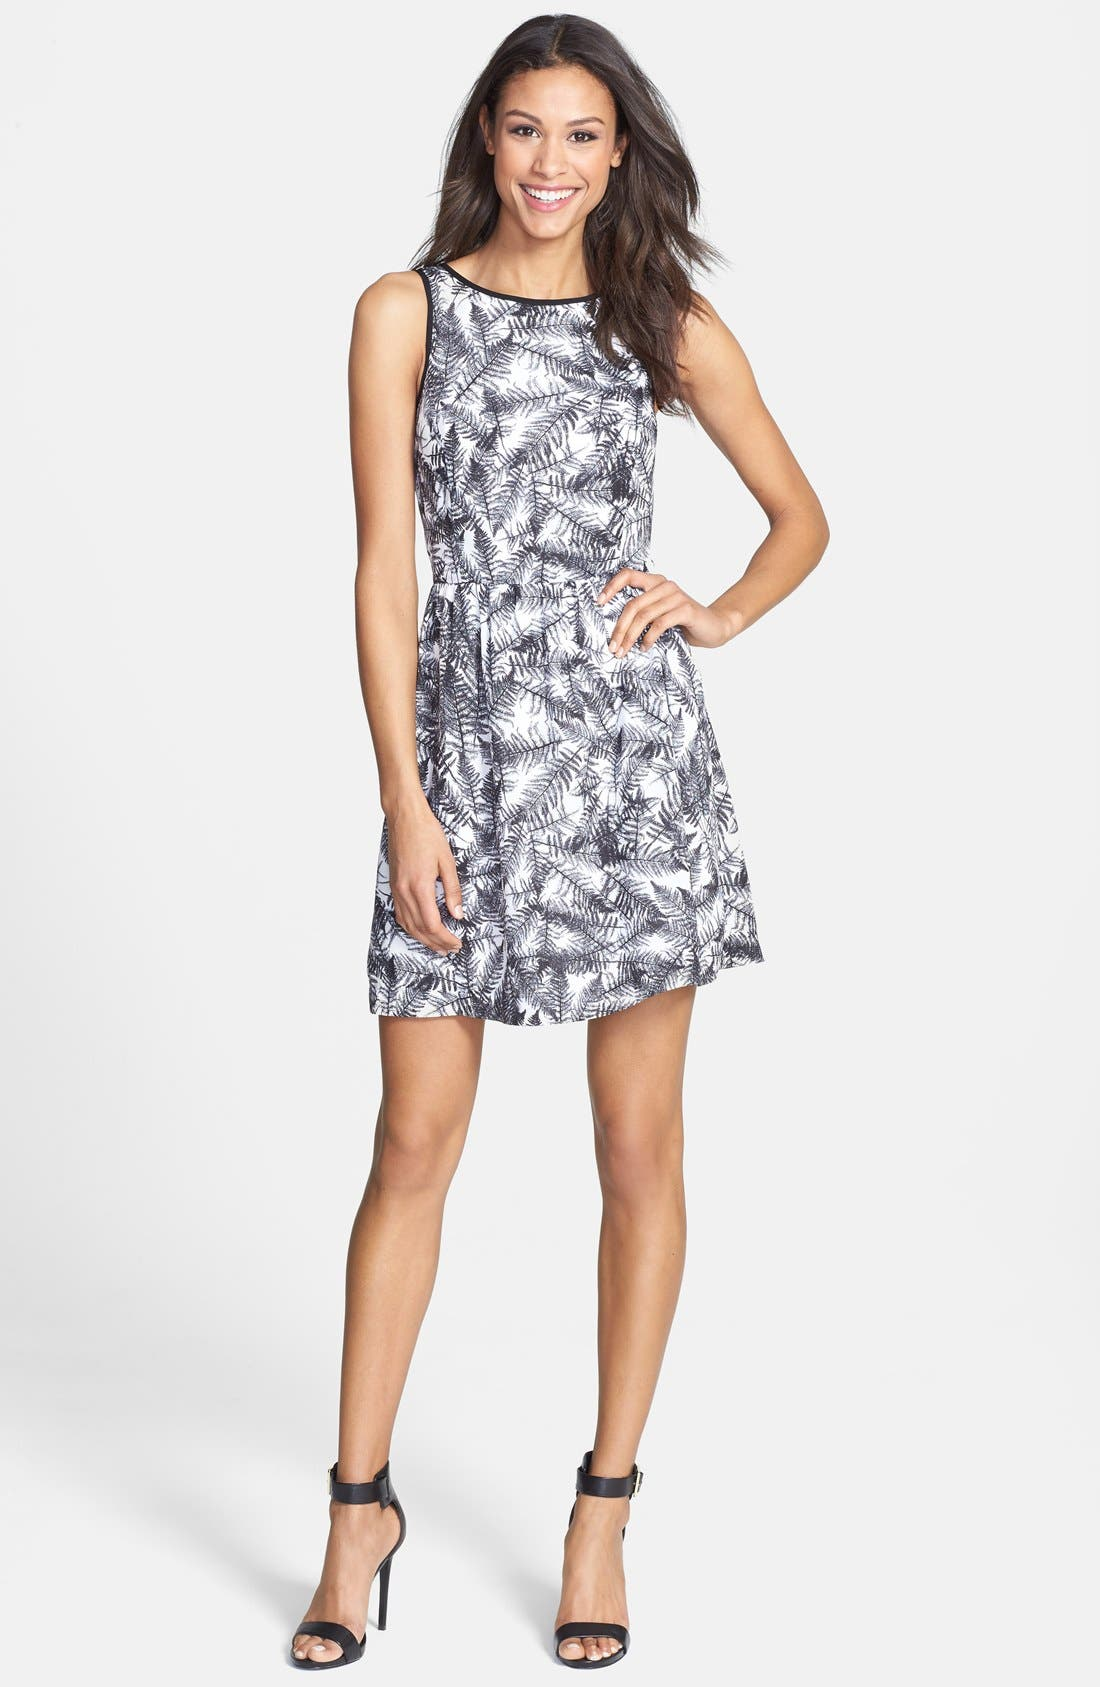 Main Image - kensie 'Overlapped Ferns' Print Fit & Flare Dress